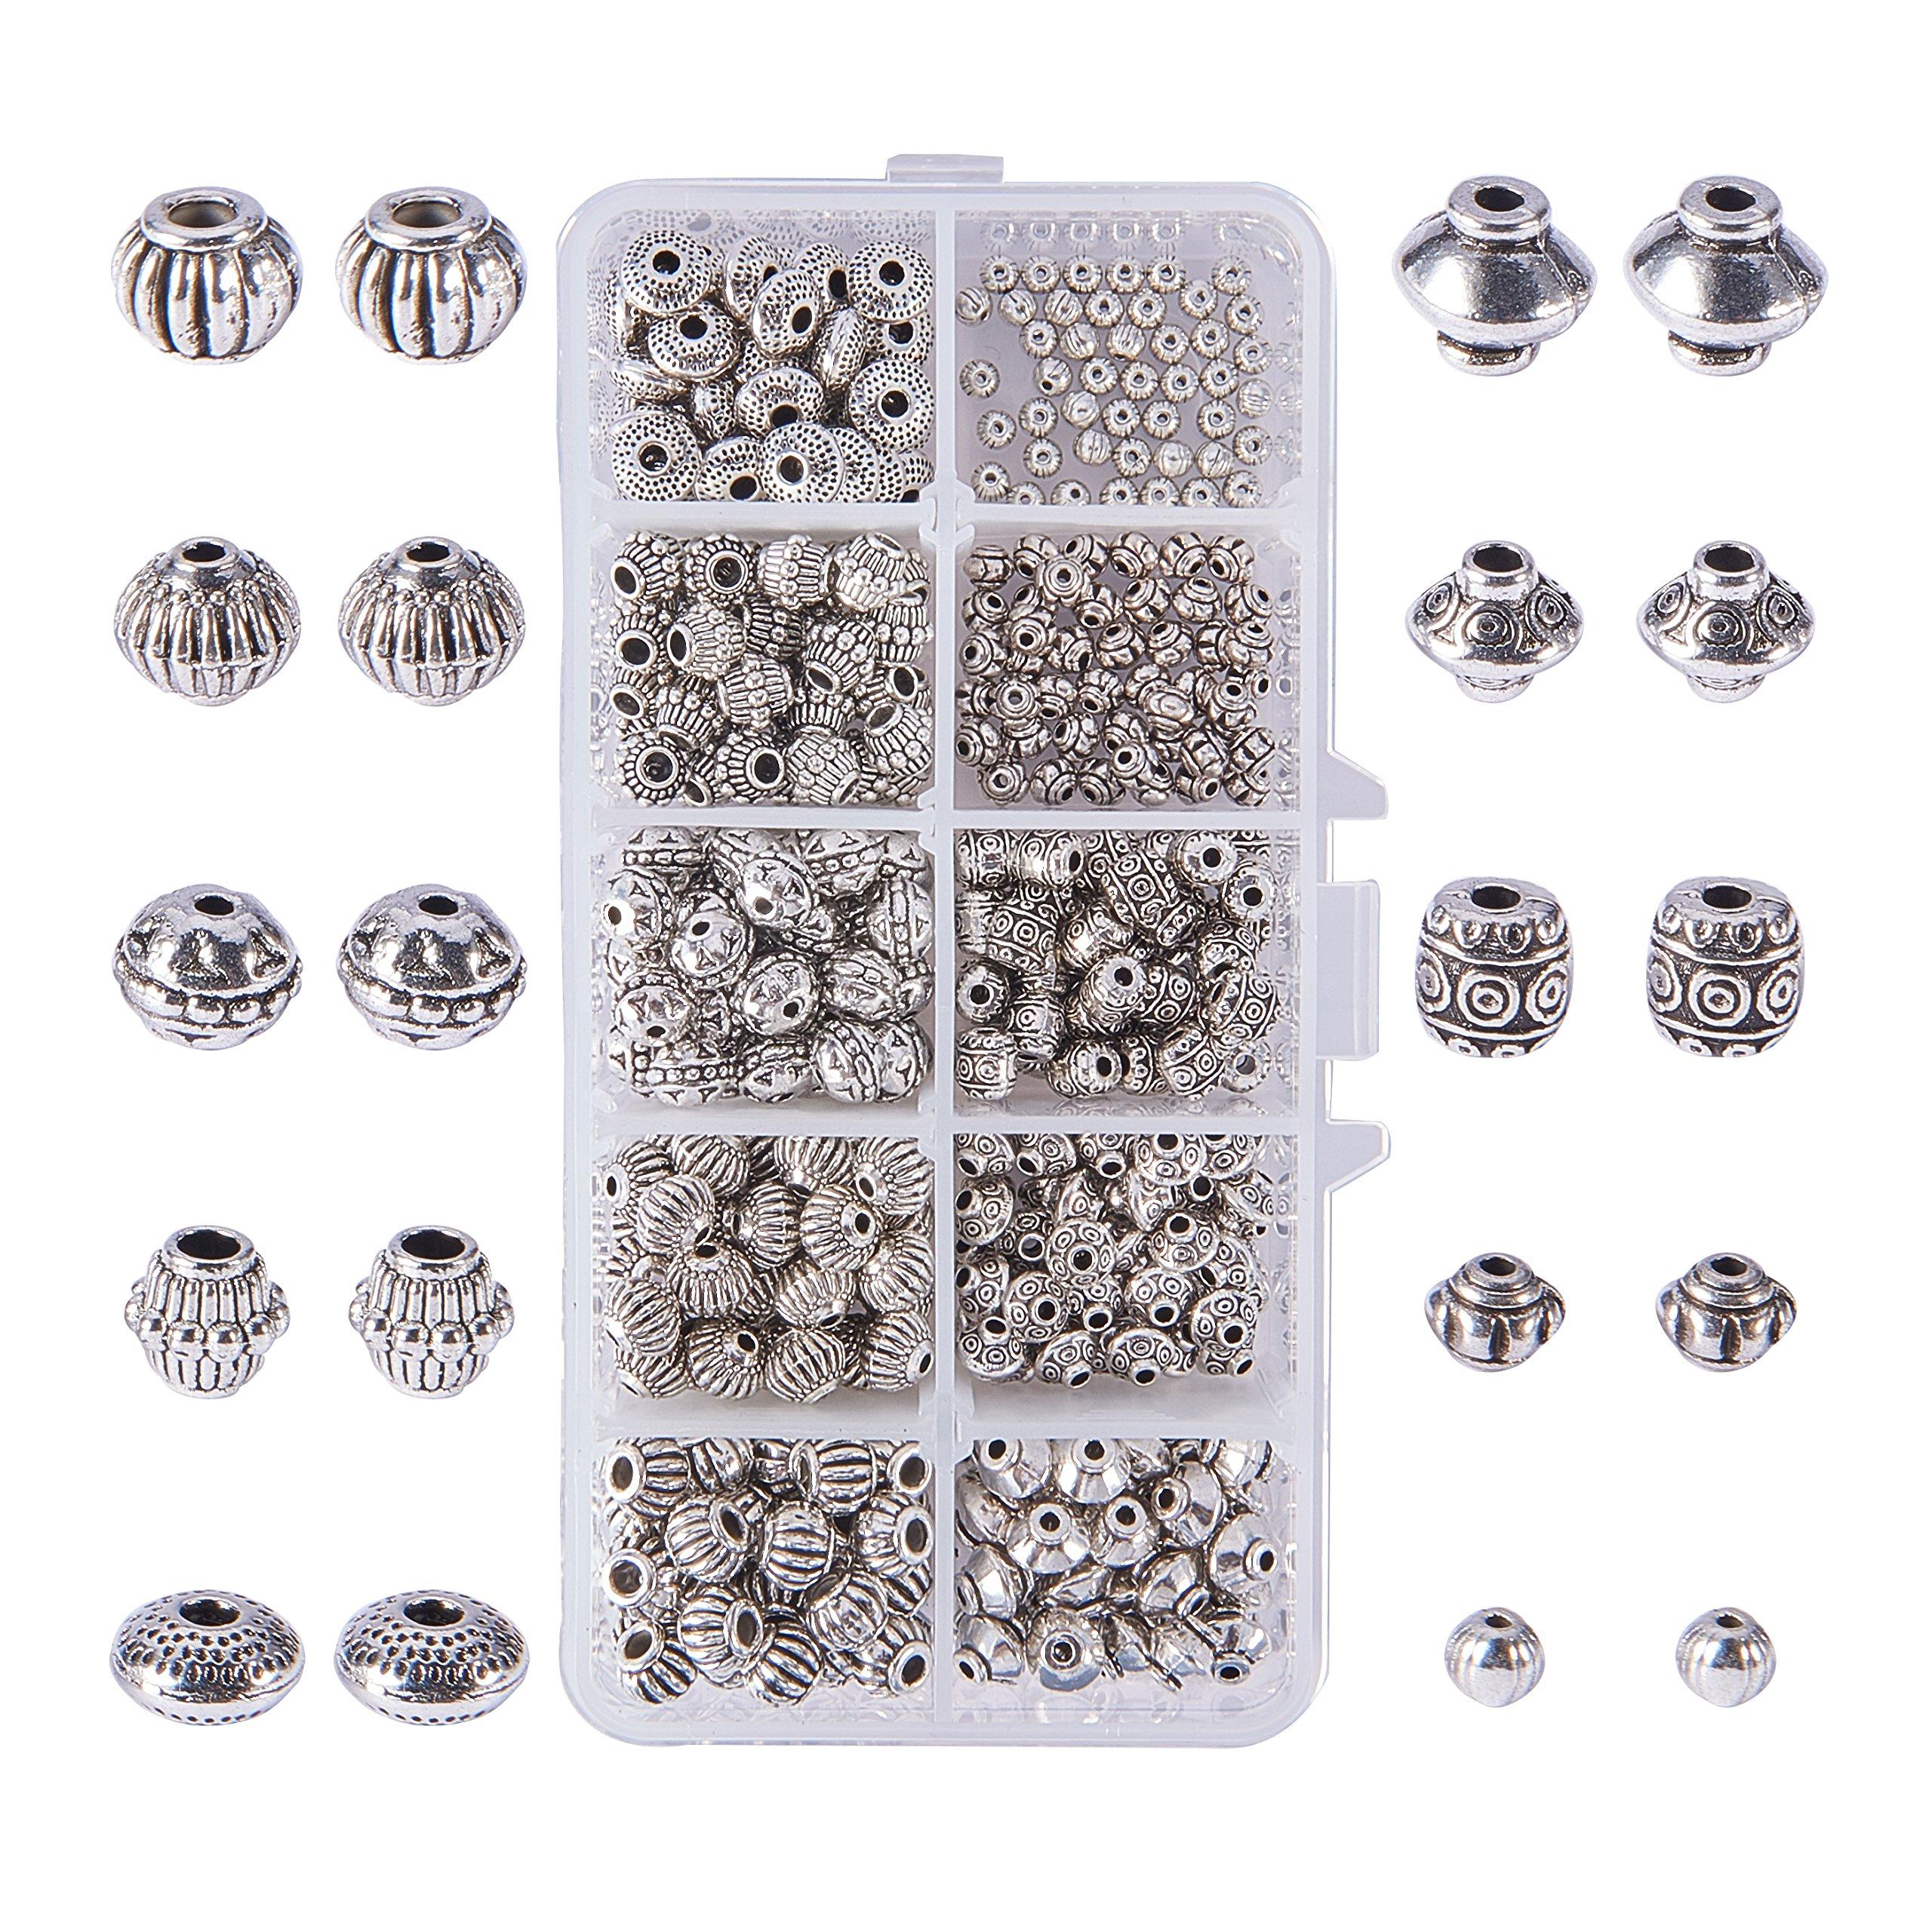 PandaHall Elite about 500pcs 10 Styles Spacer Beads Tibetan Alloy Antique Silver